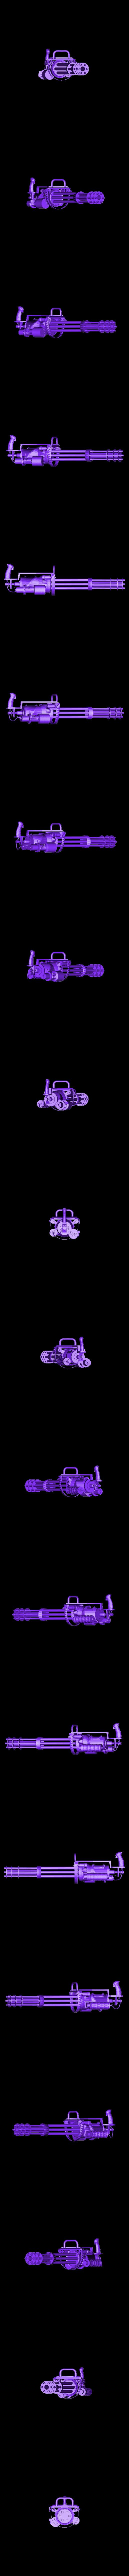 Light minigun.stl Download free STL file Light Minigun • 3D printable model, detaildesigner